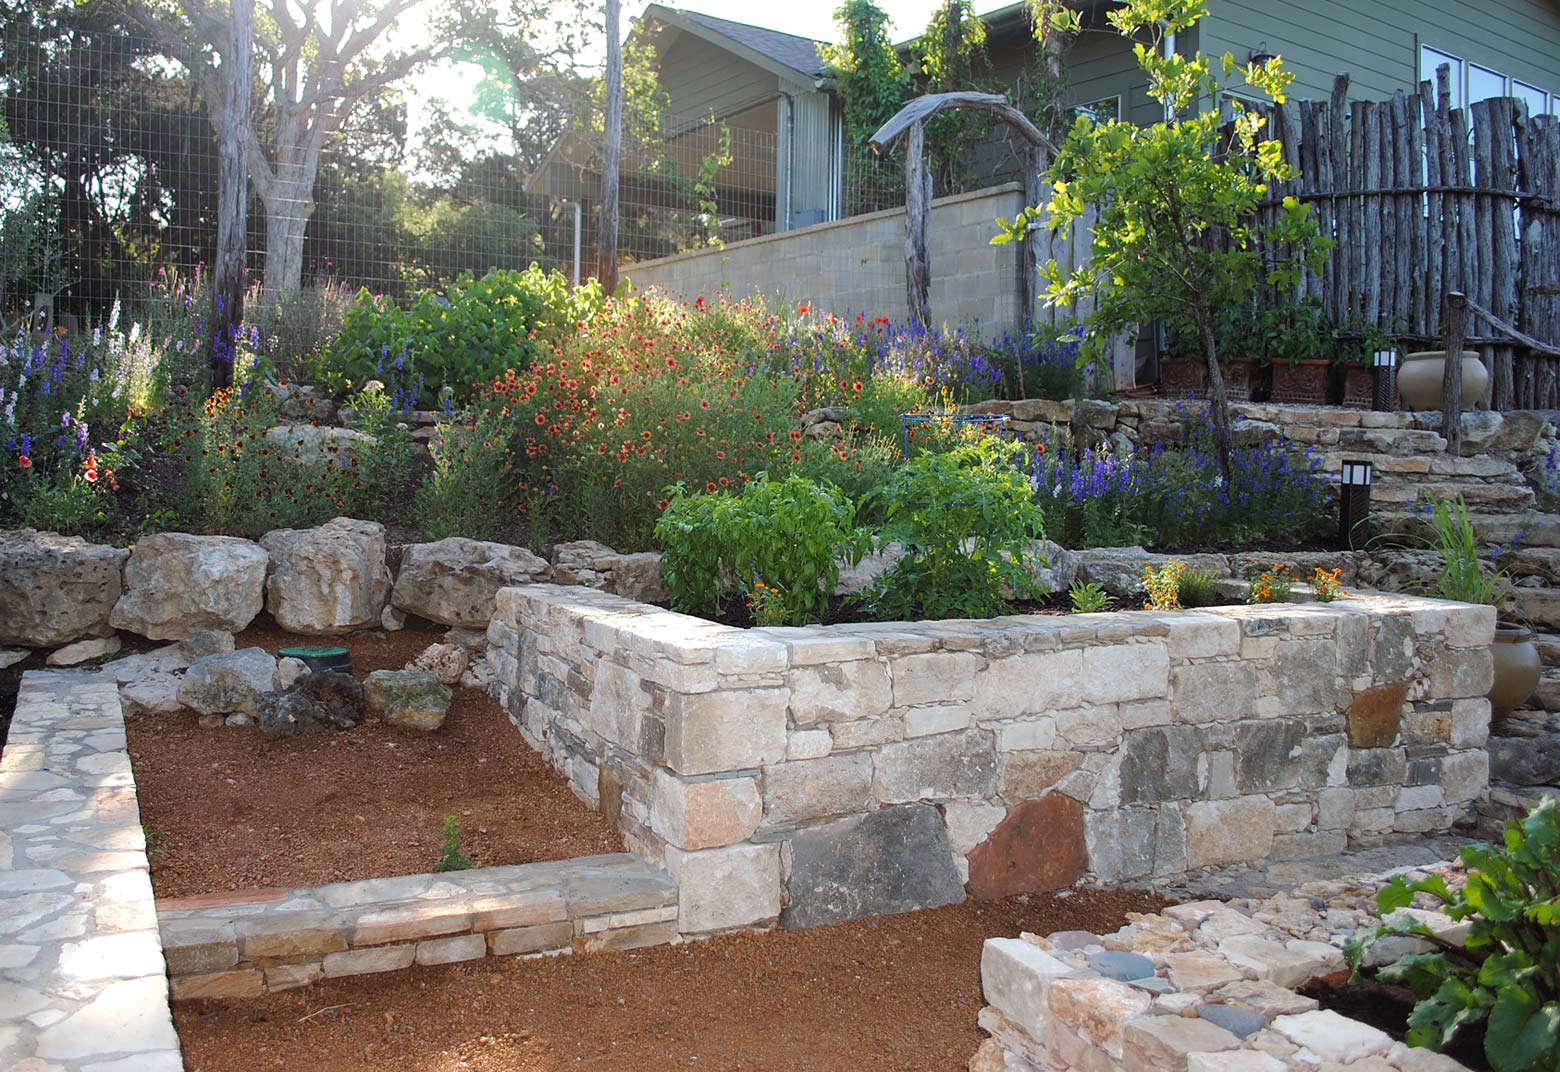 BEE-CAVE-retaining-walls-raised-beds-Gardenista-16